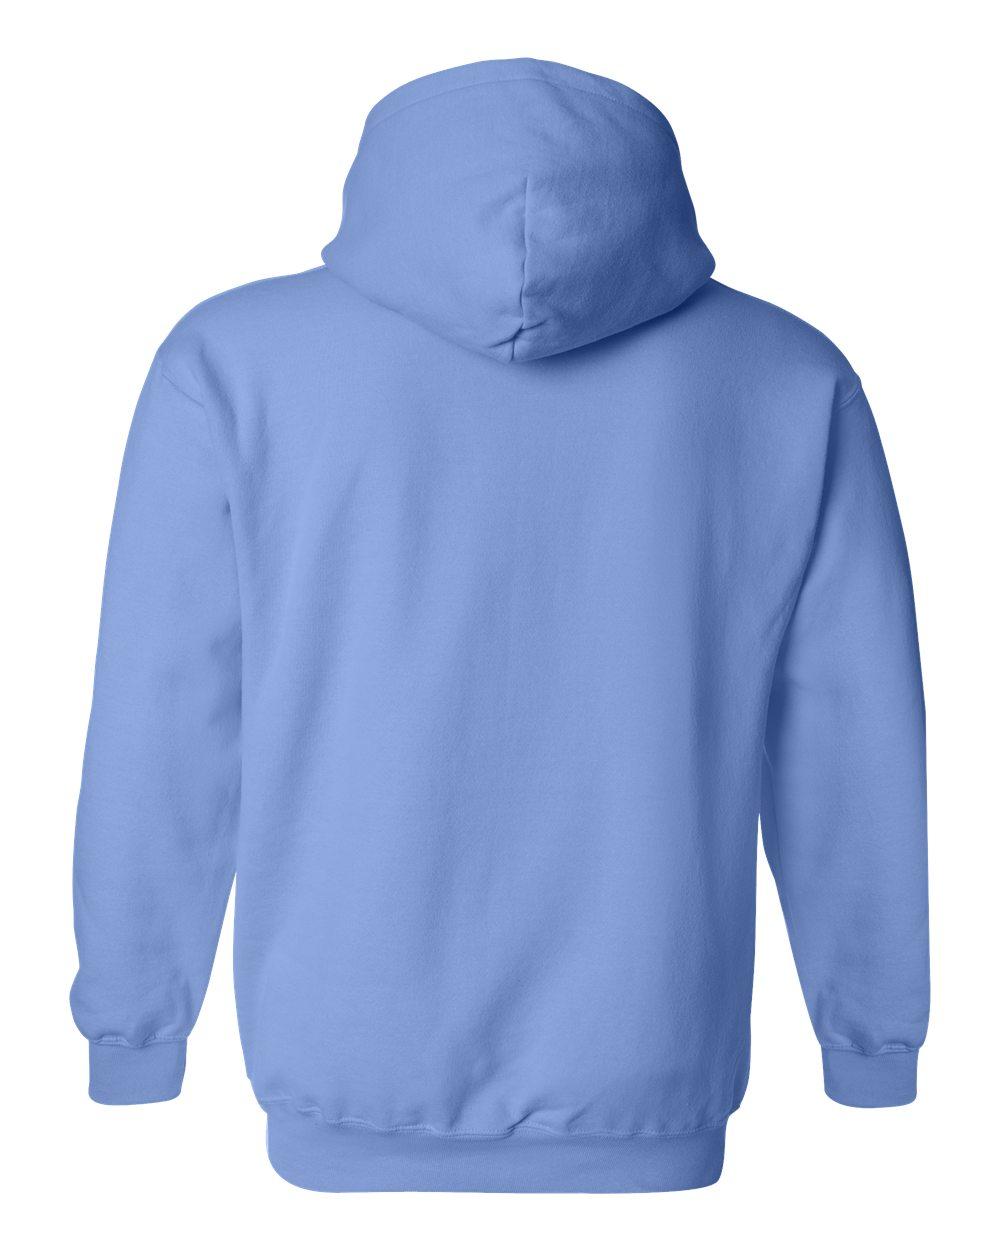 Gildan-Mens-Blank-Hoodie-Heavy-Blend-Hooded-Sweatshirt-Solid-18500-up-to-5XL thumbnail 16